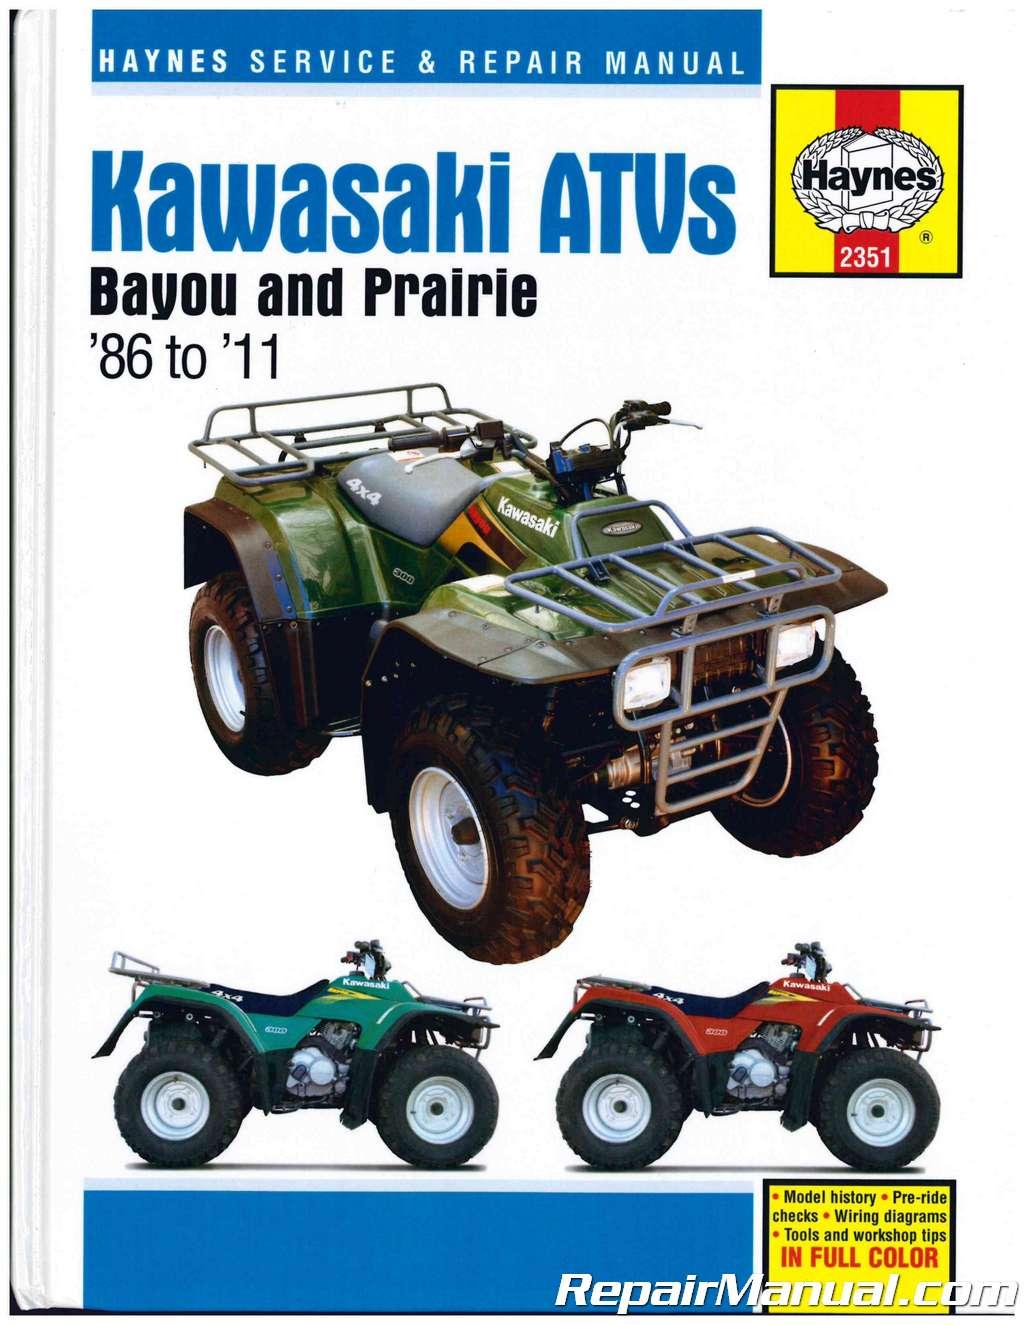 1986-2011 Kawasaki Bayou 220 300/Prairie ATV Repair Manual 2010 2009 2008 174X